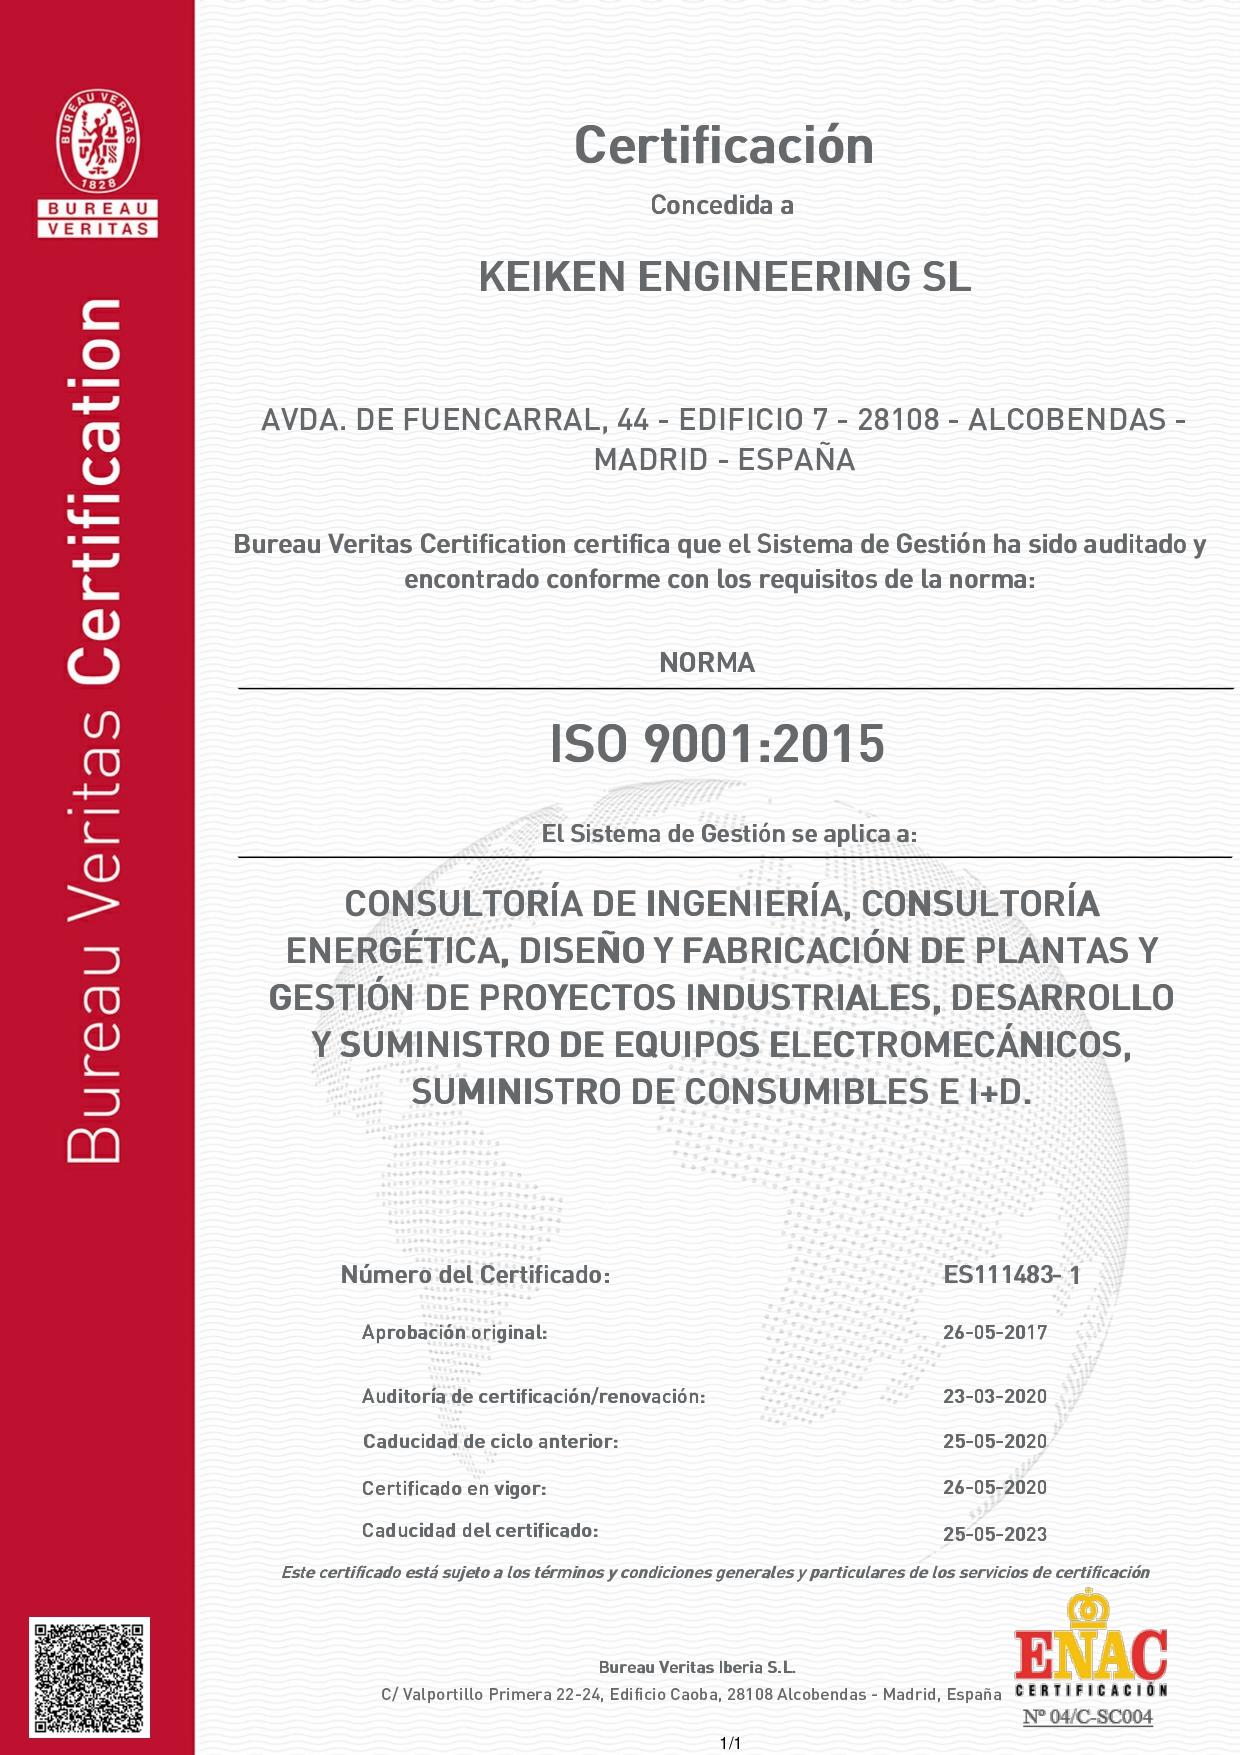 6676180-BUP-KEIKEN ENGINEERING SL-ESPAÑOL